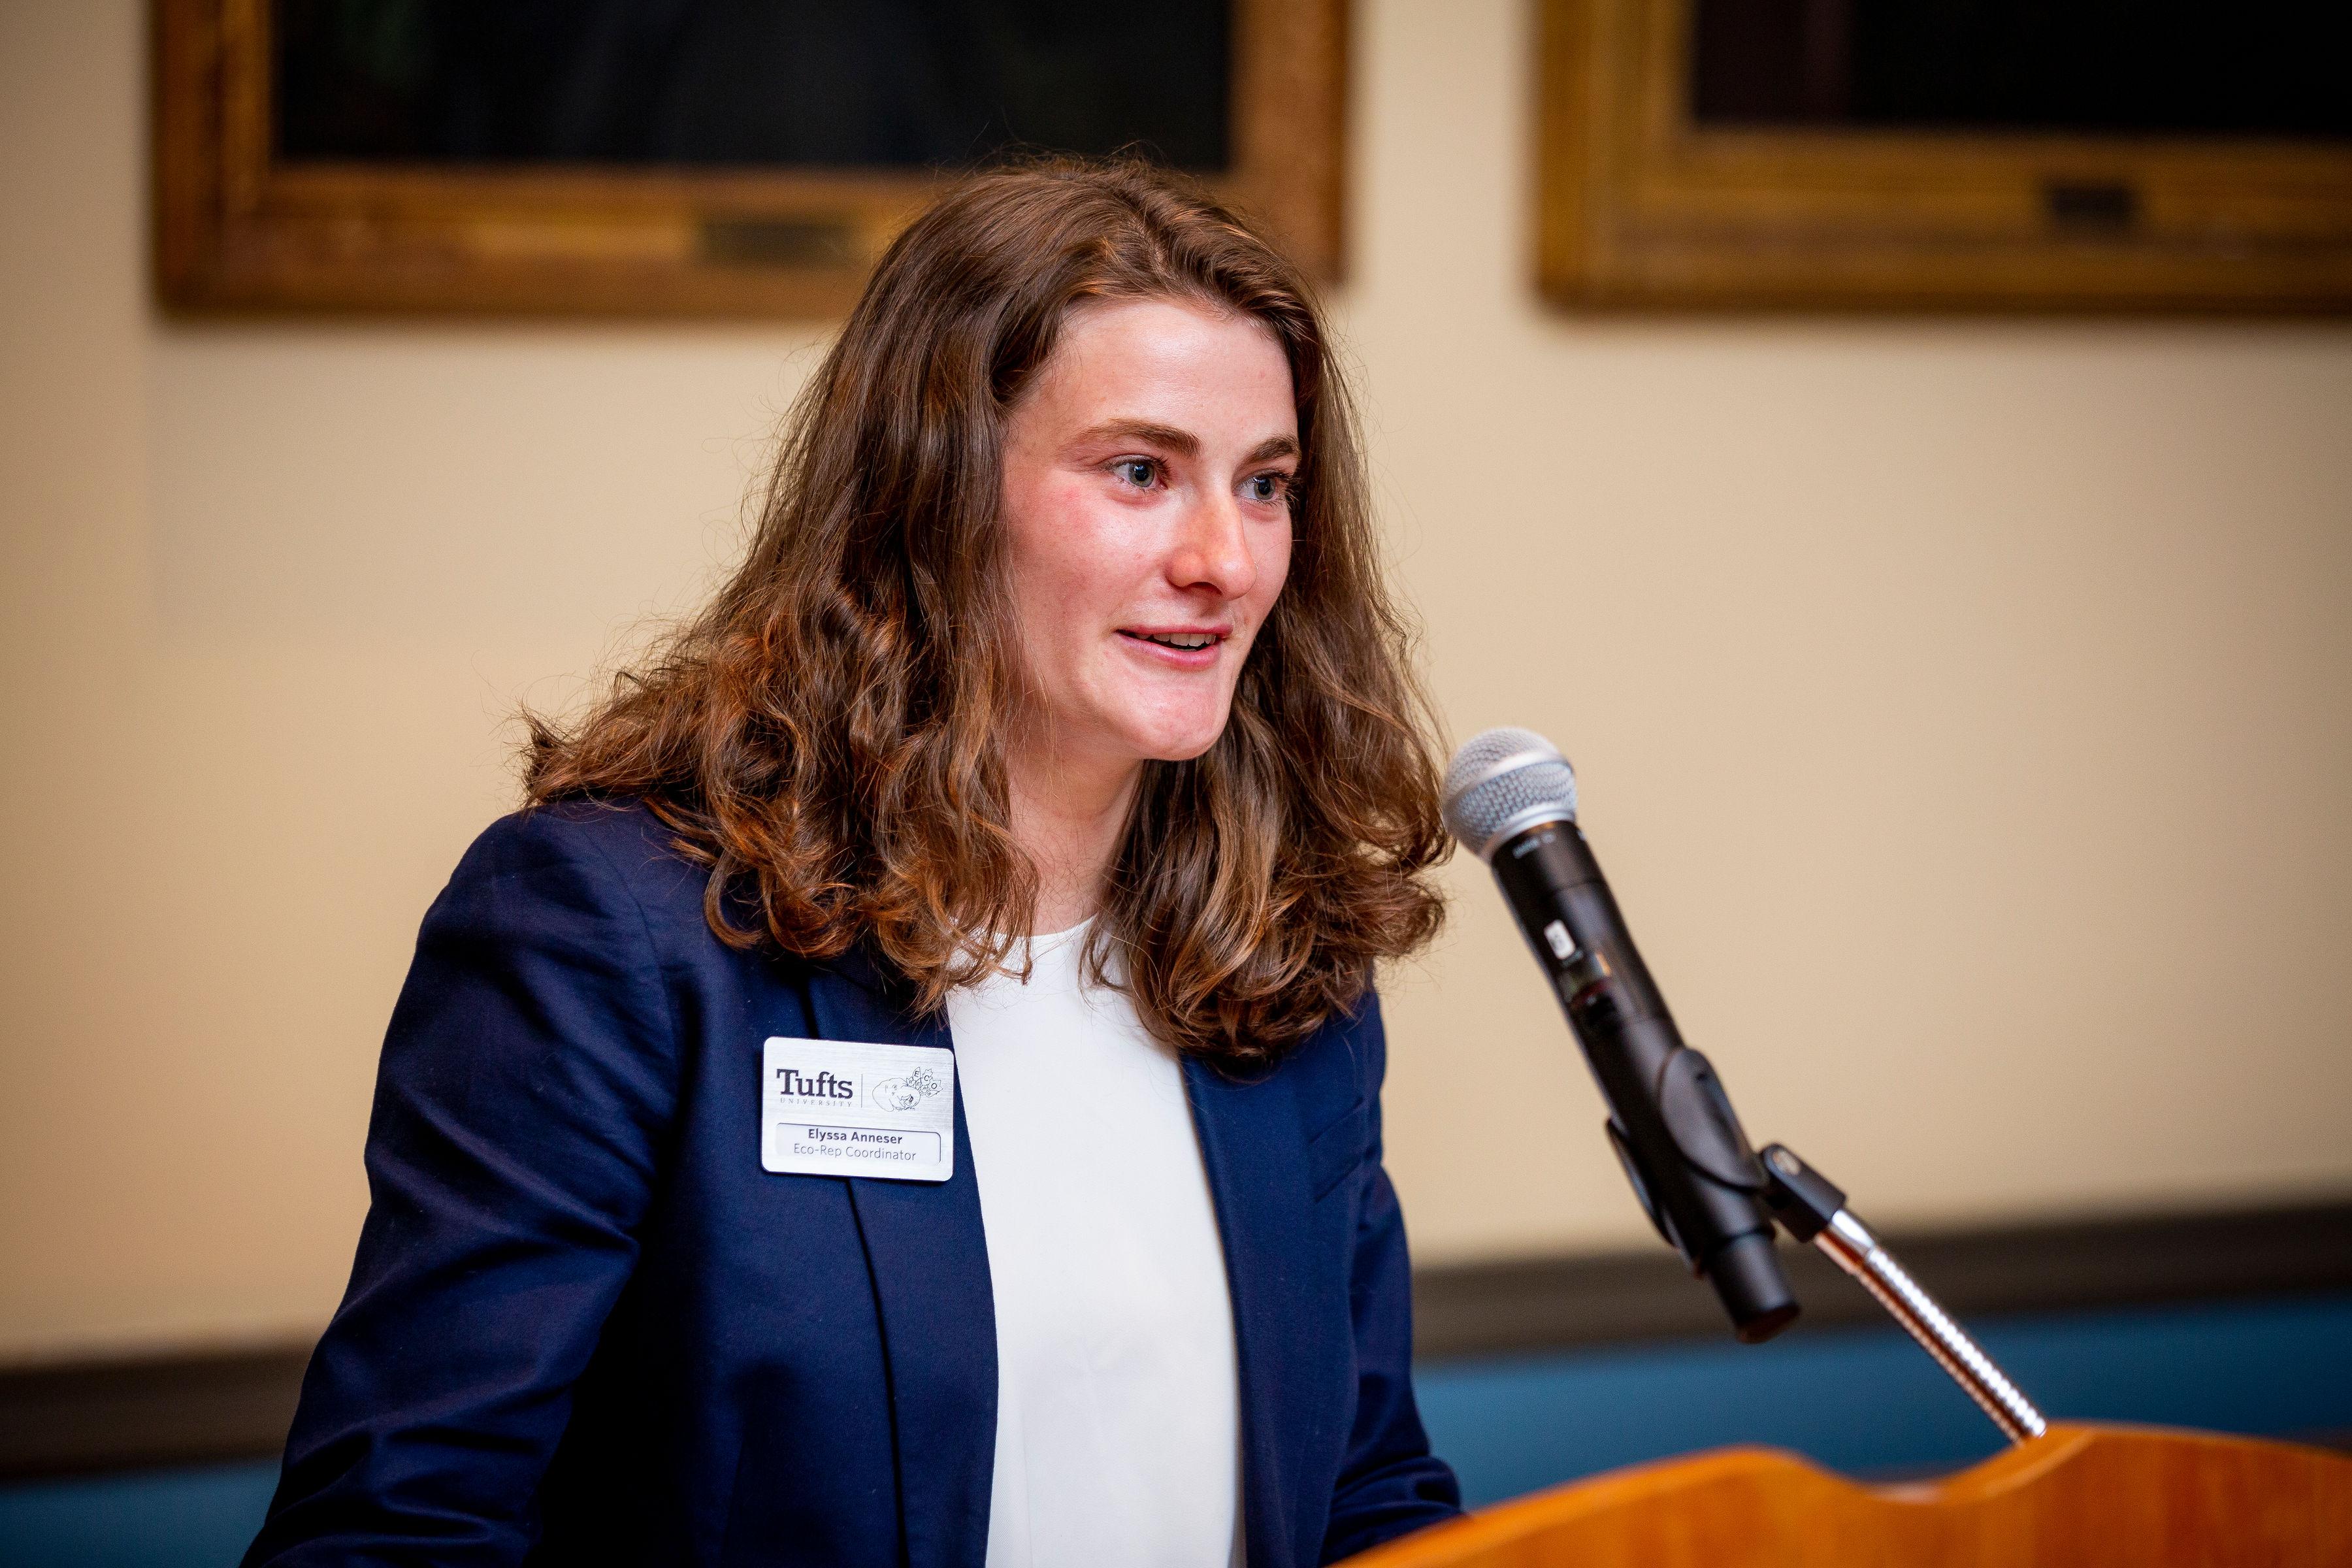 Elisa speaking at Sustainability Champions Ceremony